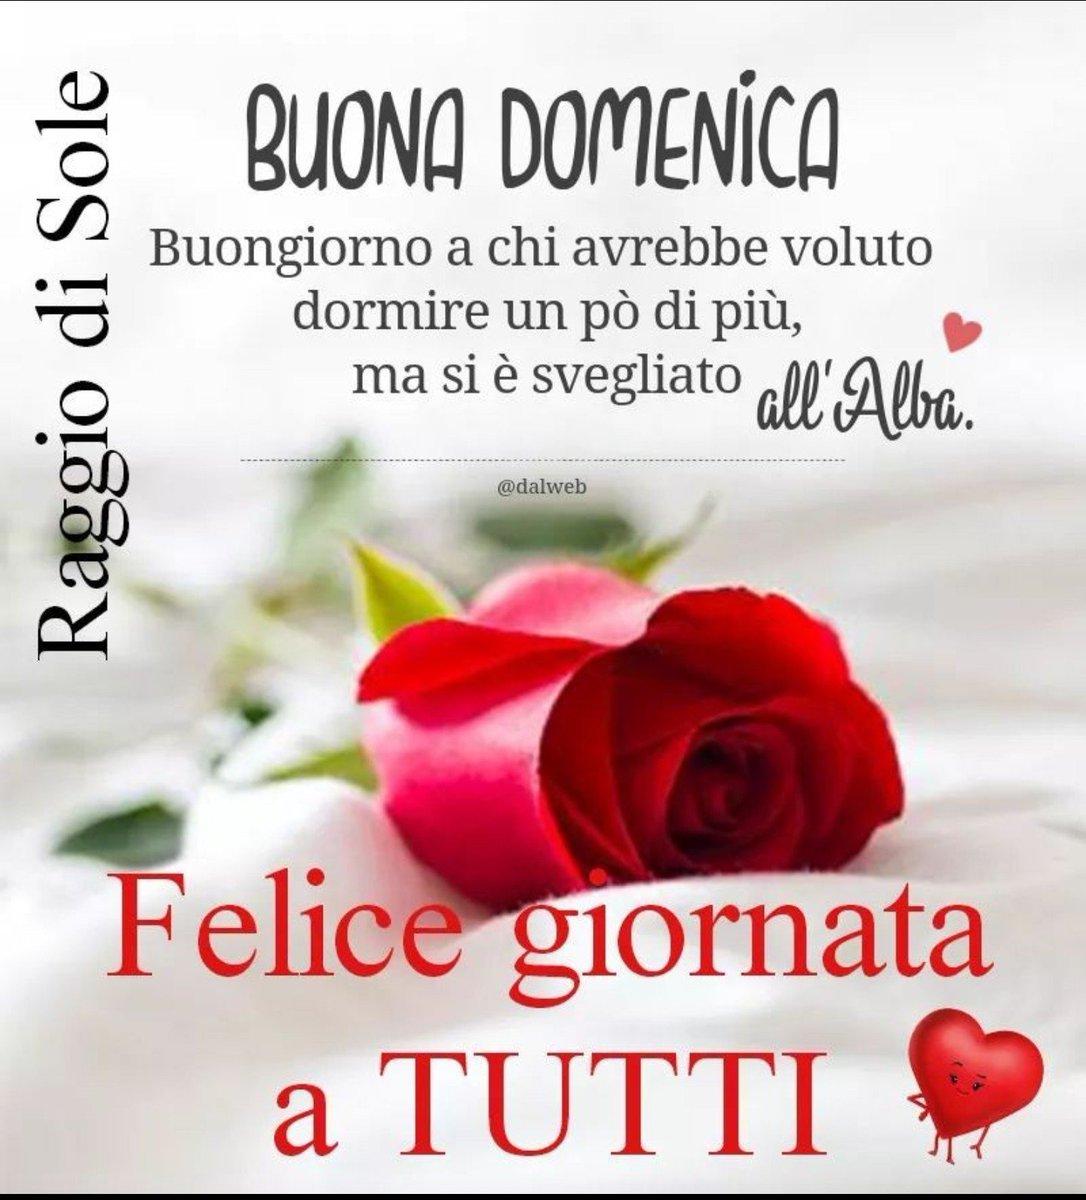 Paolettapaly On Twitter Un Caro Saluto A Mamma Tuae Buona